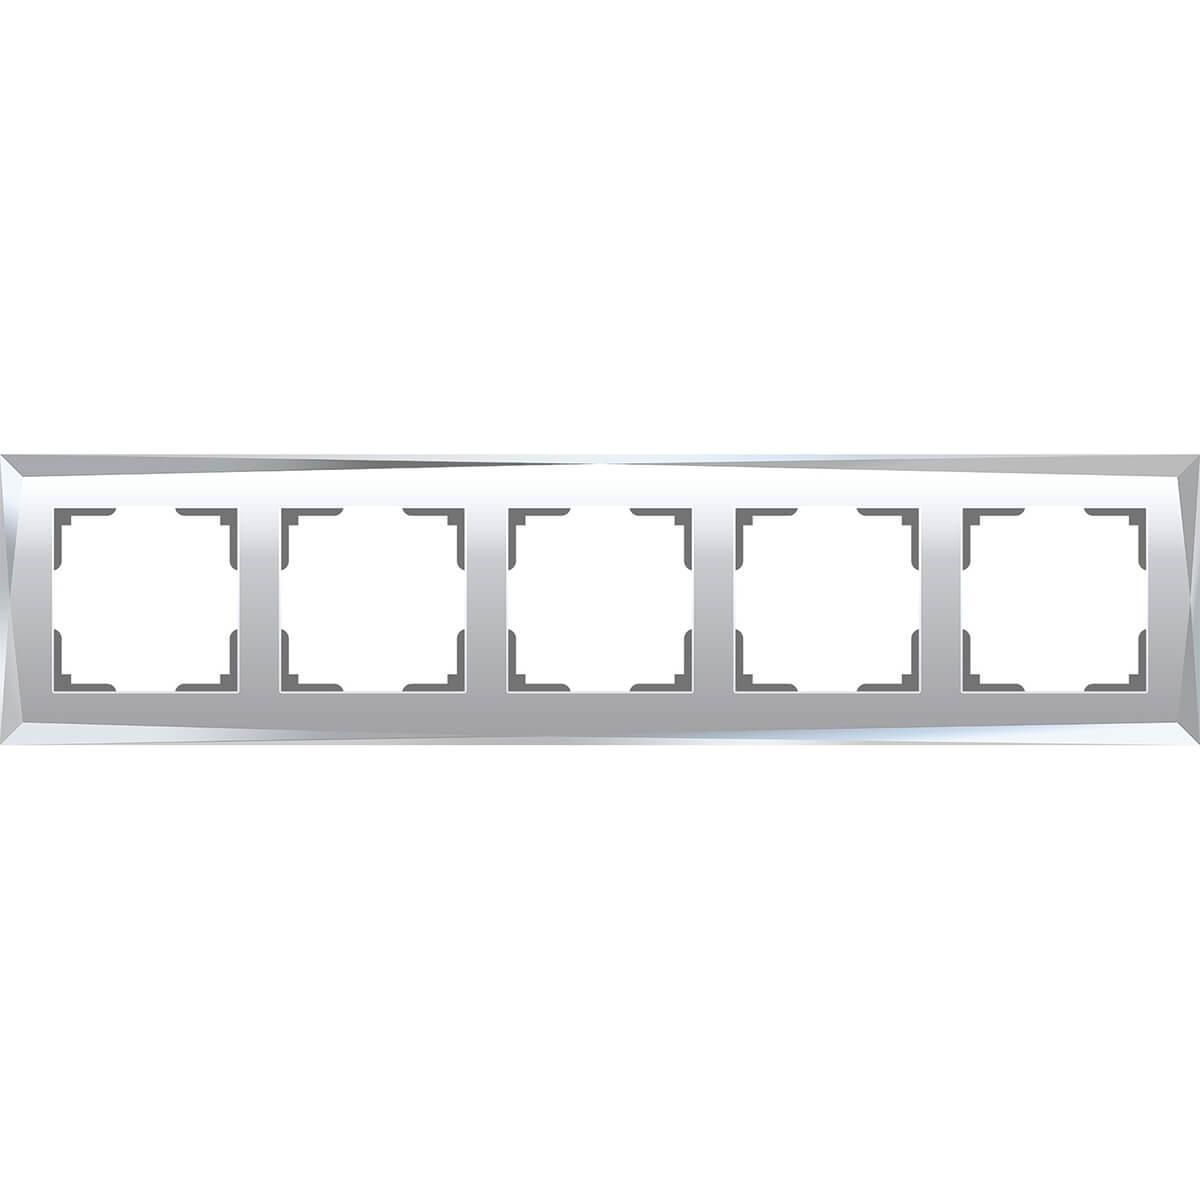 Рамка Werkel Diamant на 5 постов зеркальный WL08-Frame-05 4690389143854